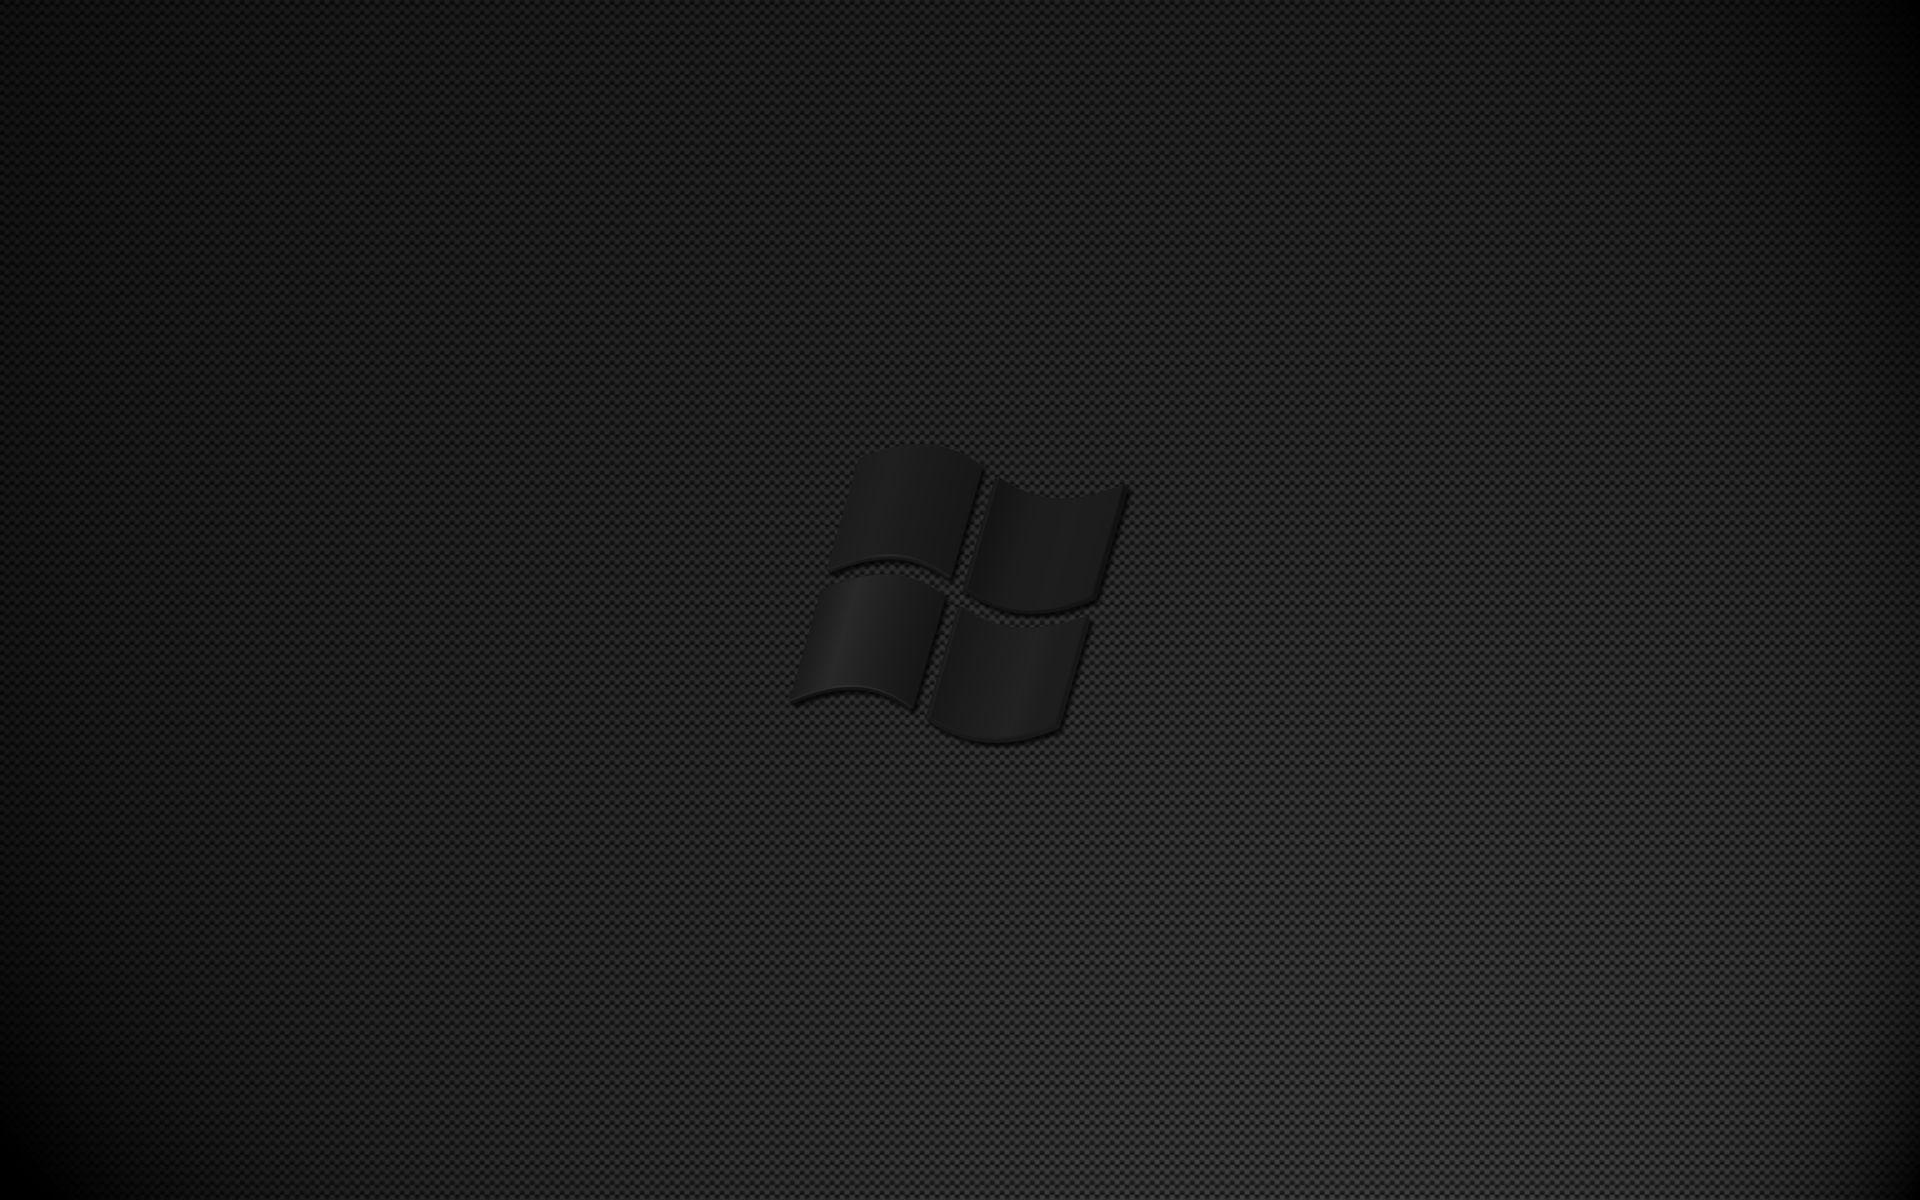 Magnificent Windows 7 Wallpaper Dark 98 For